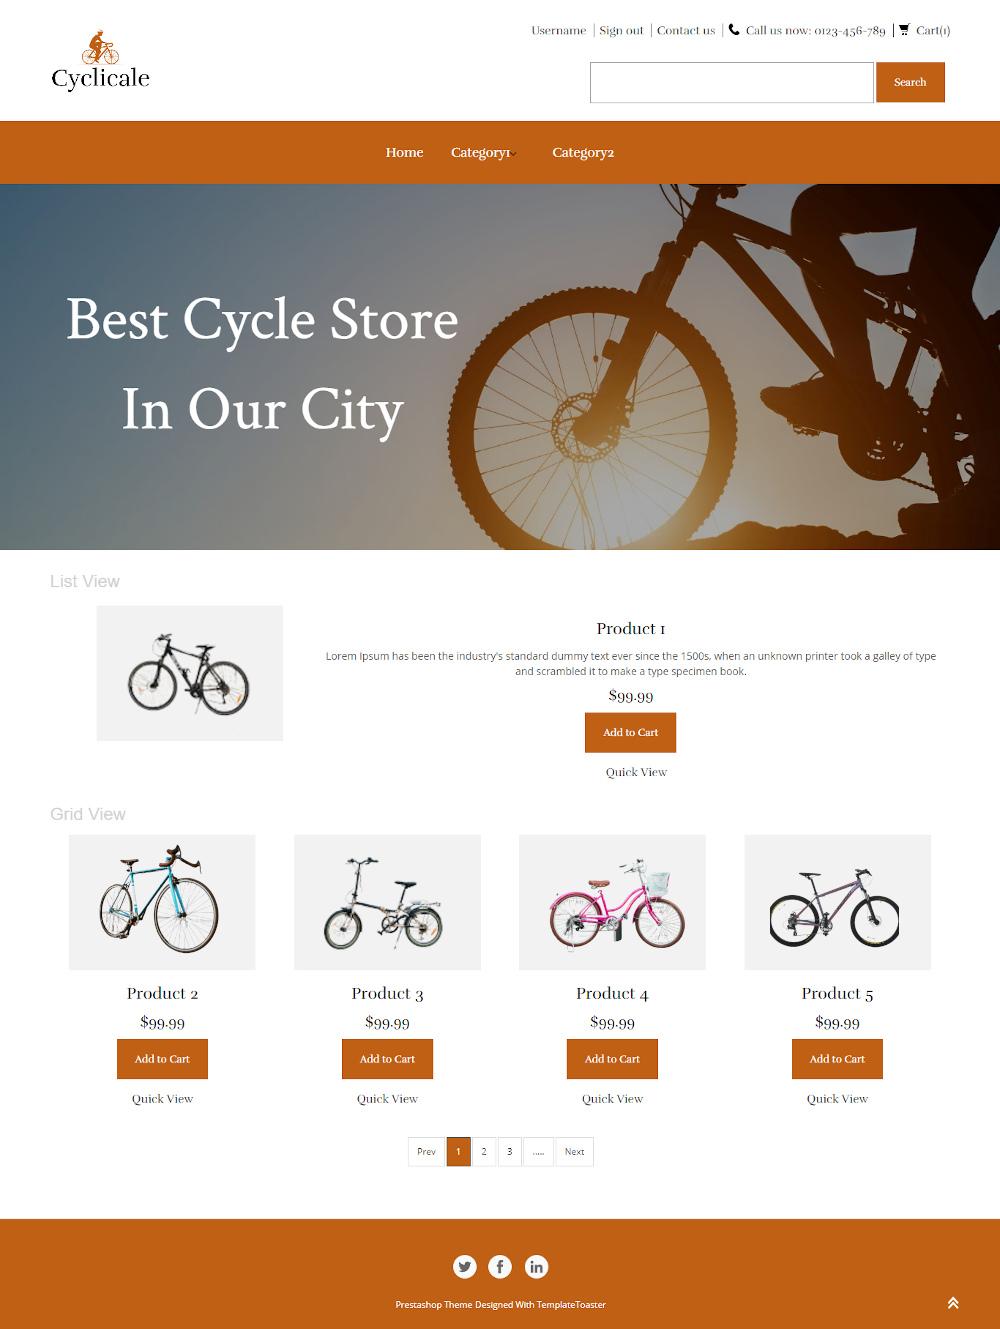 Cyclicale - Online Cycle Store PrestaShop Theme